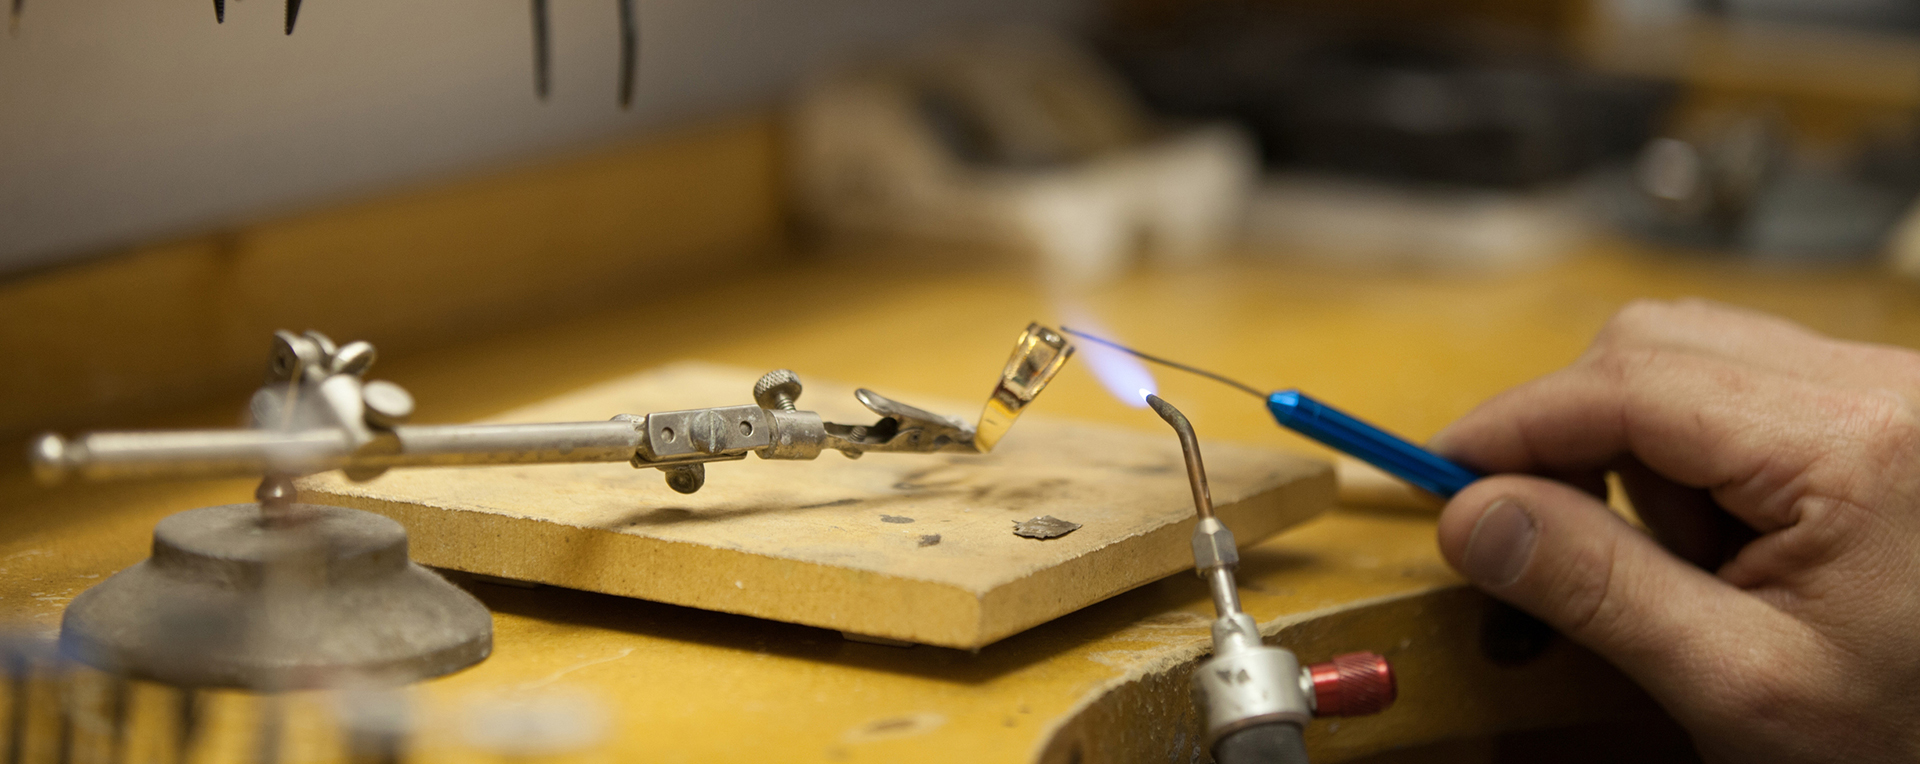 jewelry repair denver jewelry flatheadlake3on3